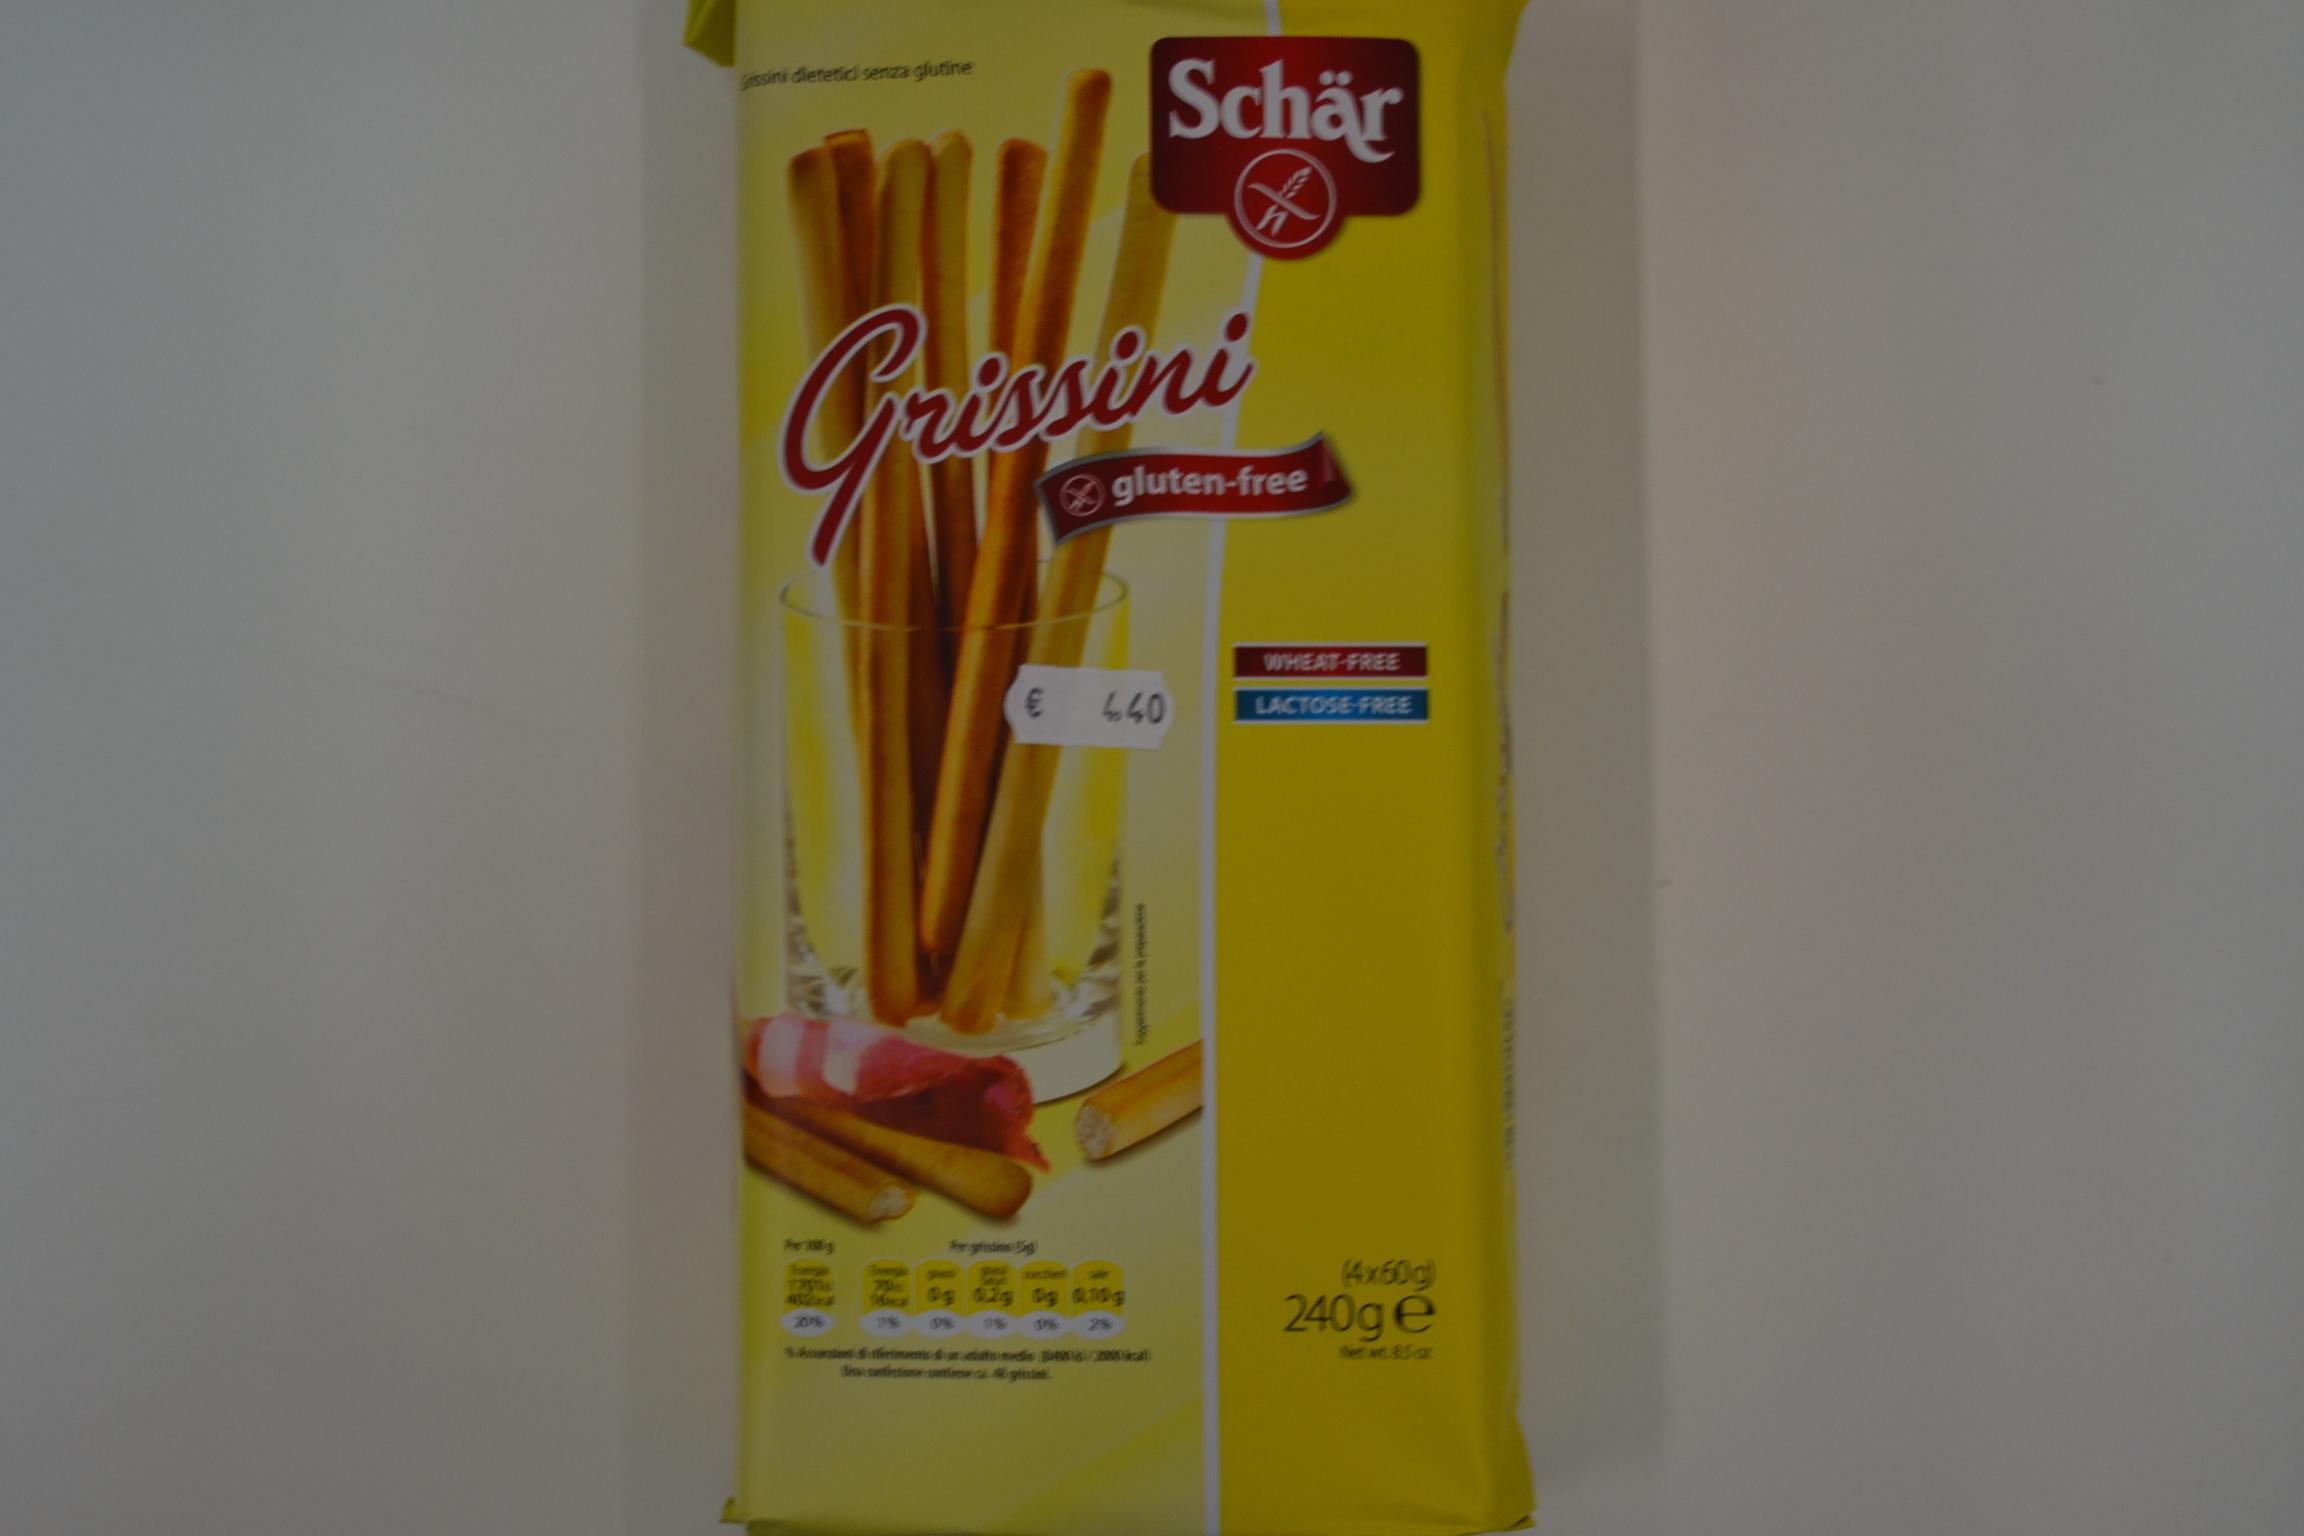 Grissini SCHAR € 4,40